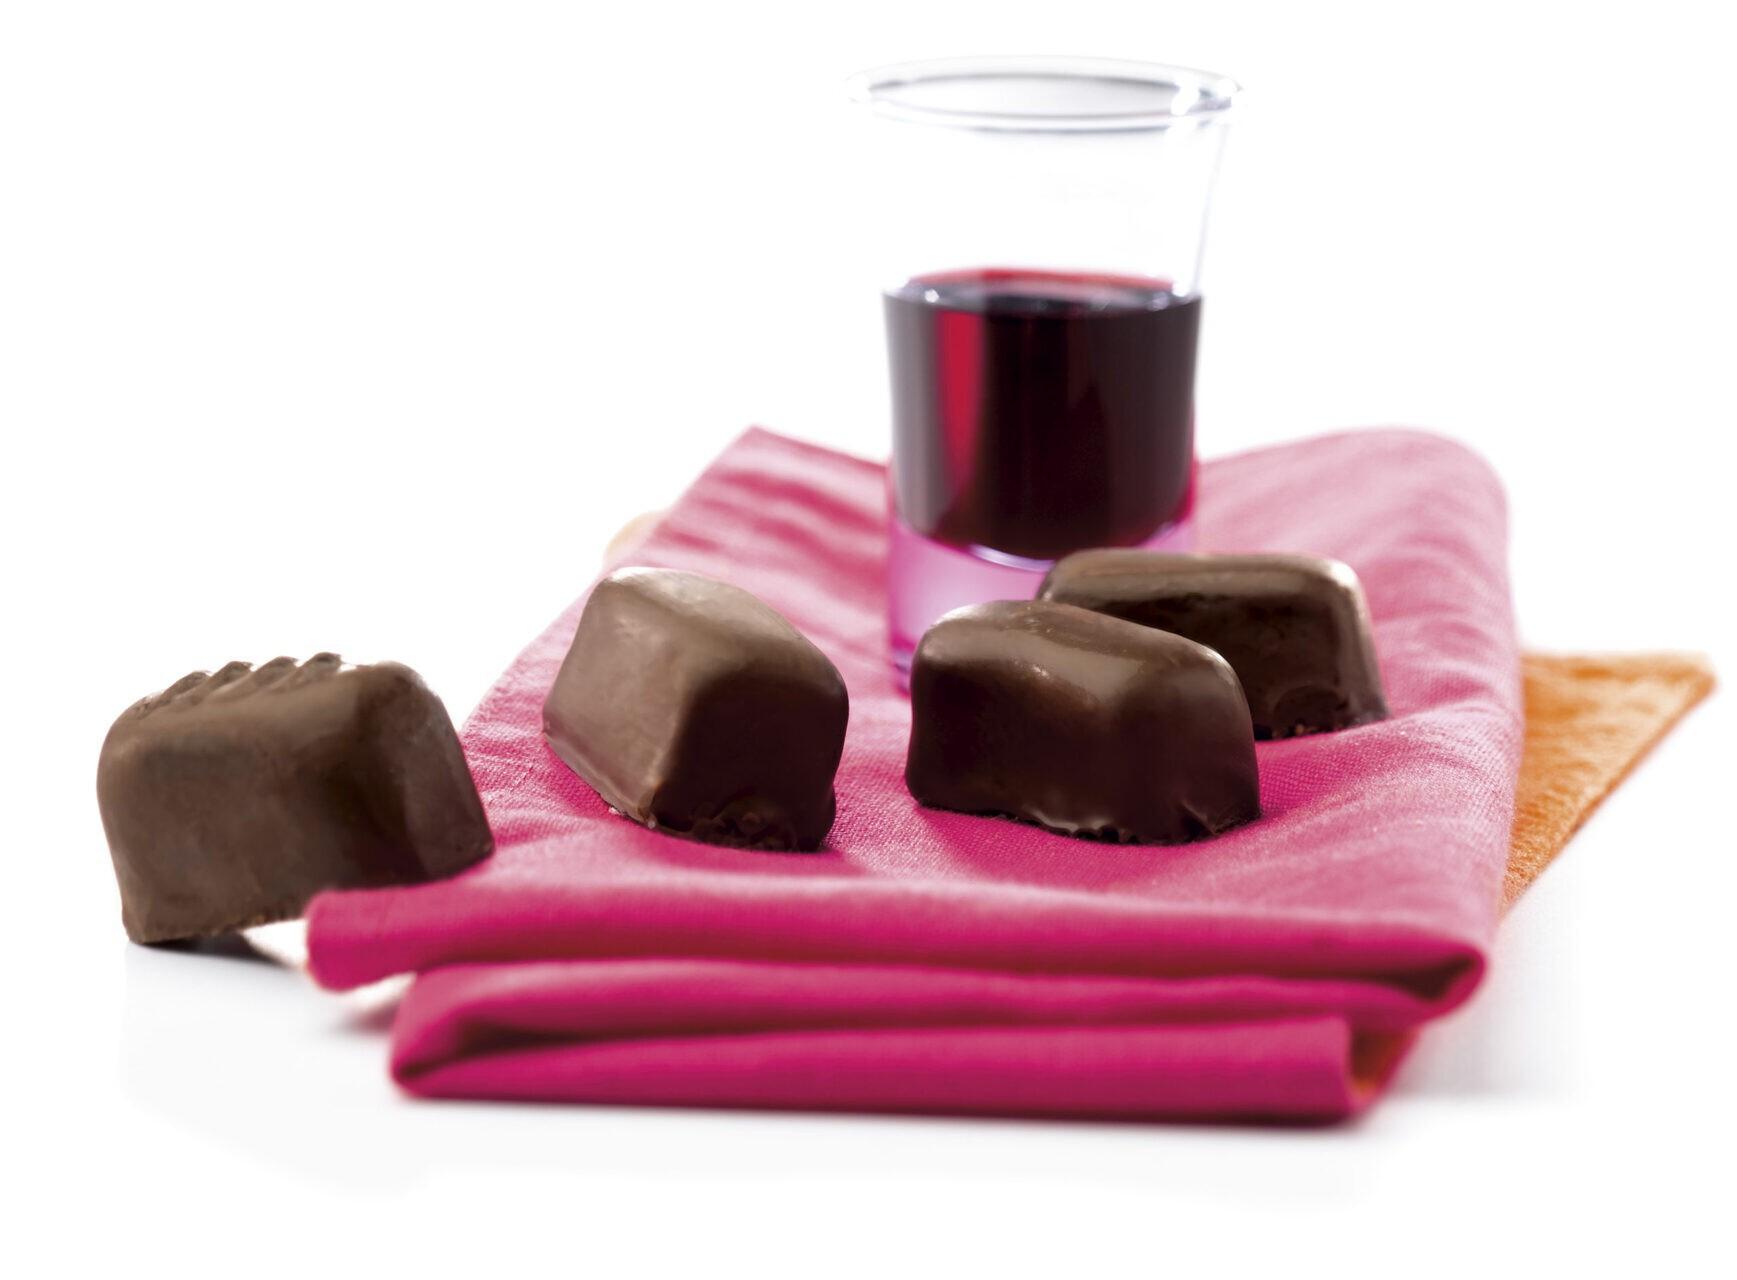 Briottet-chocolats